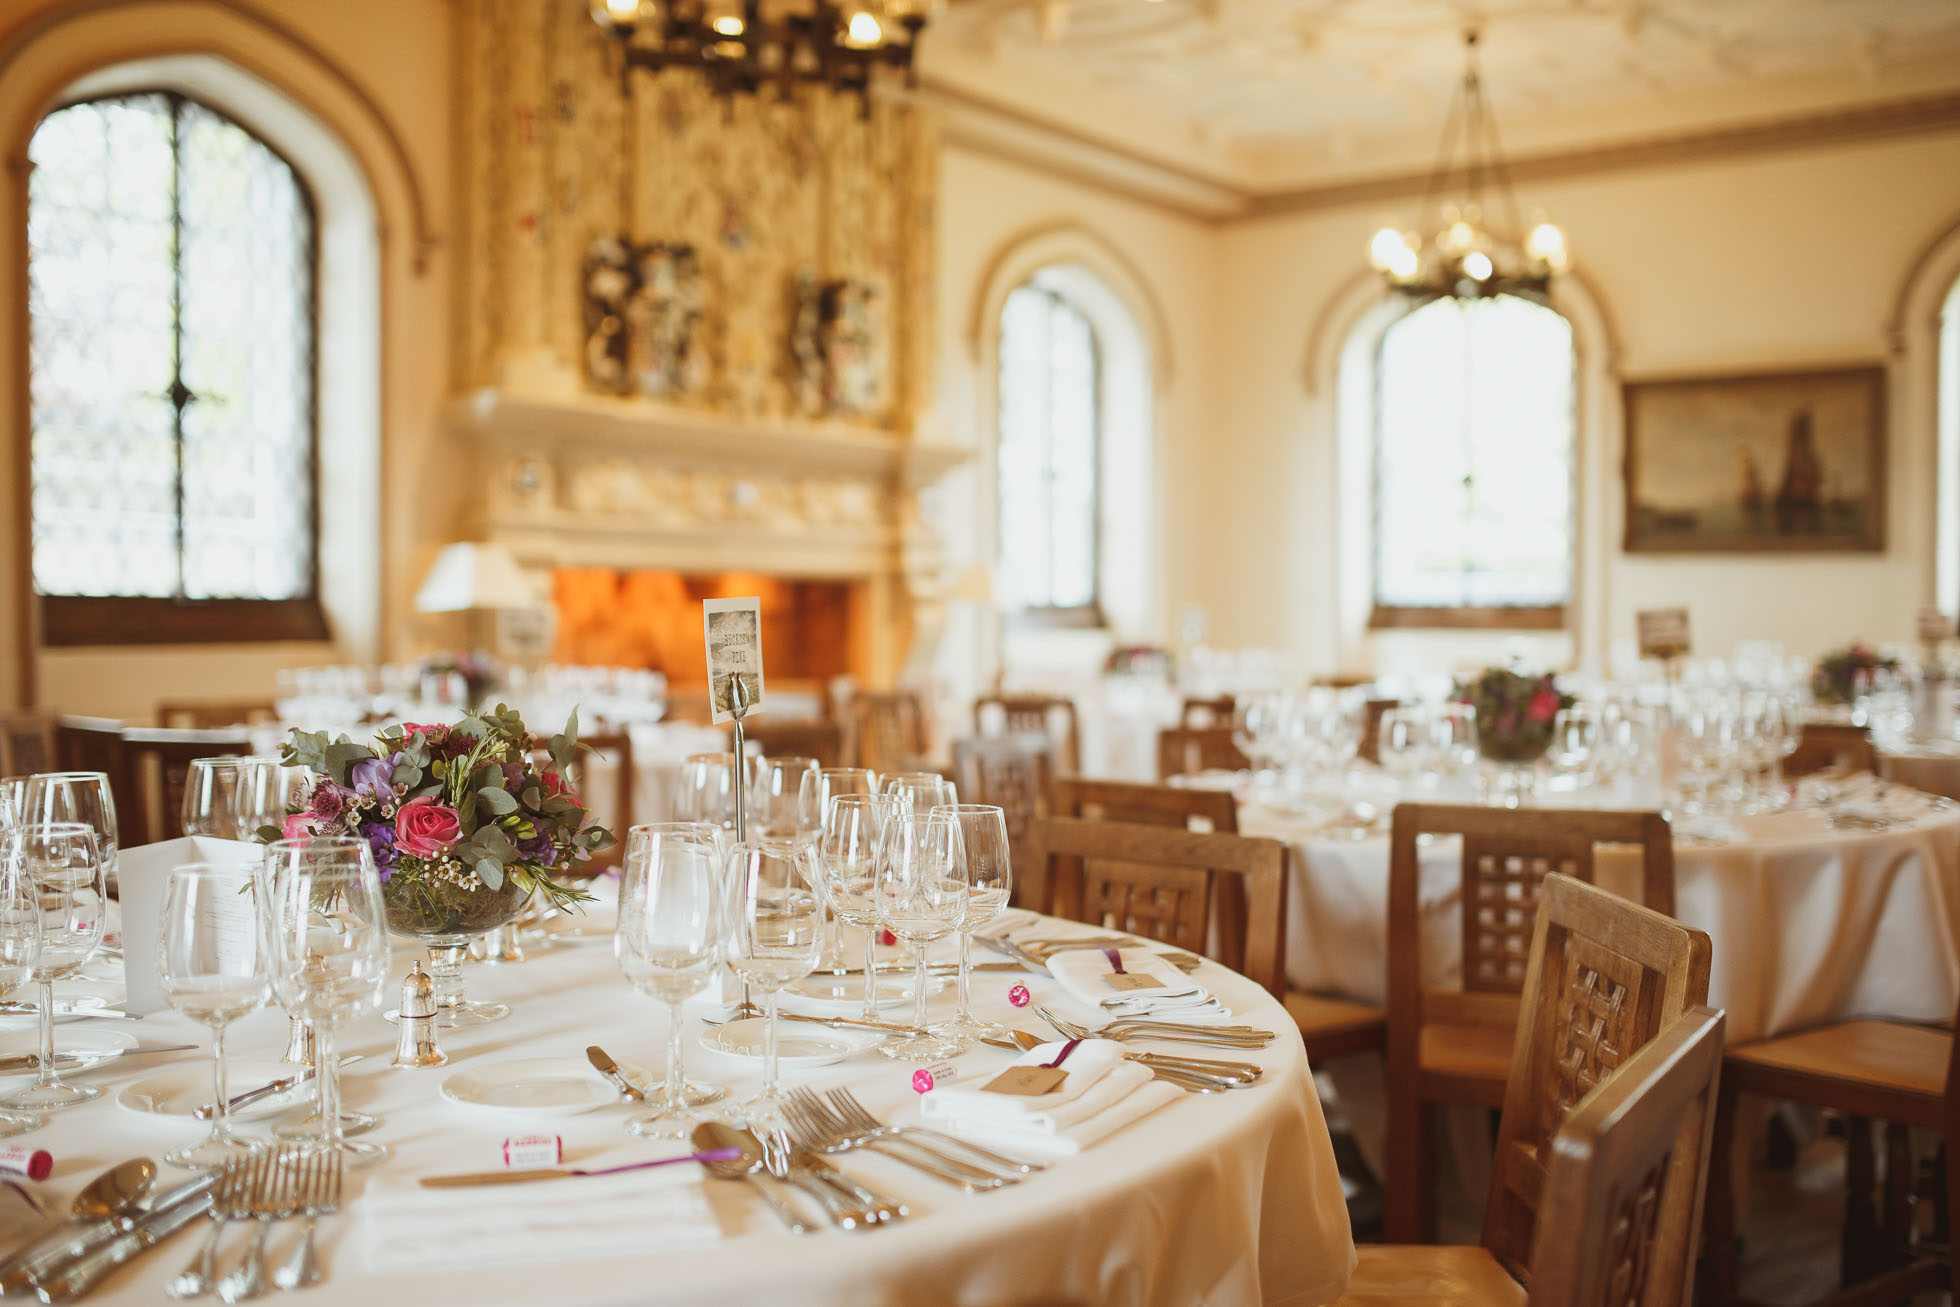 denton-hall-wedding-photographer-11.jpg